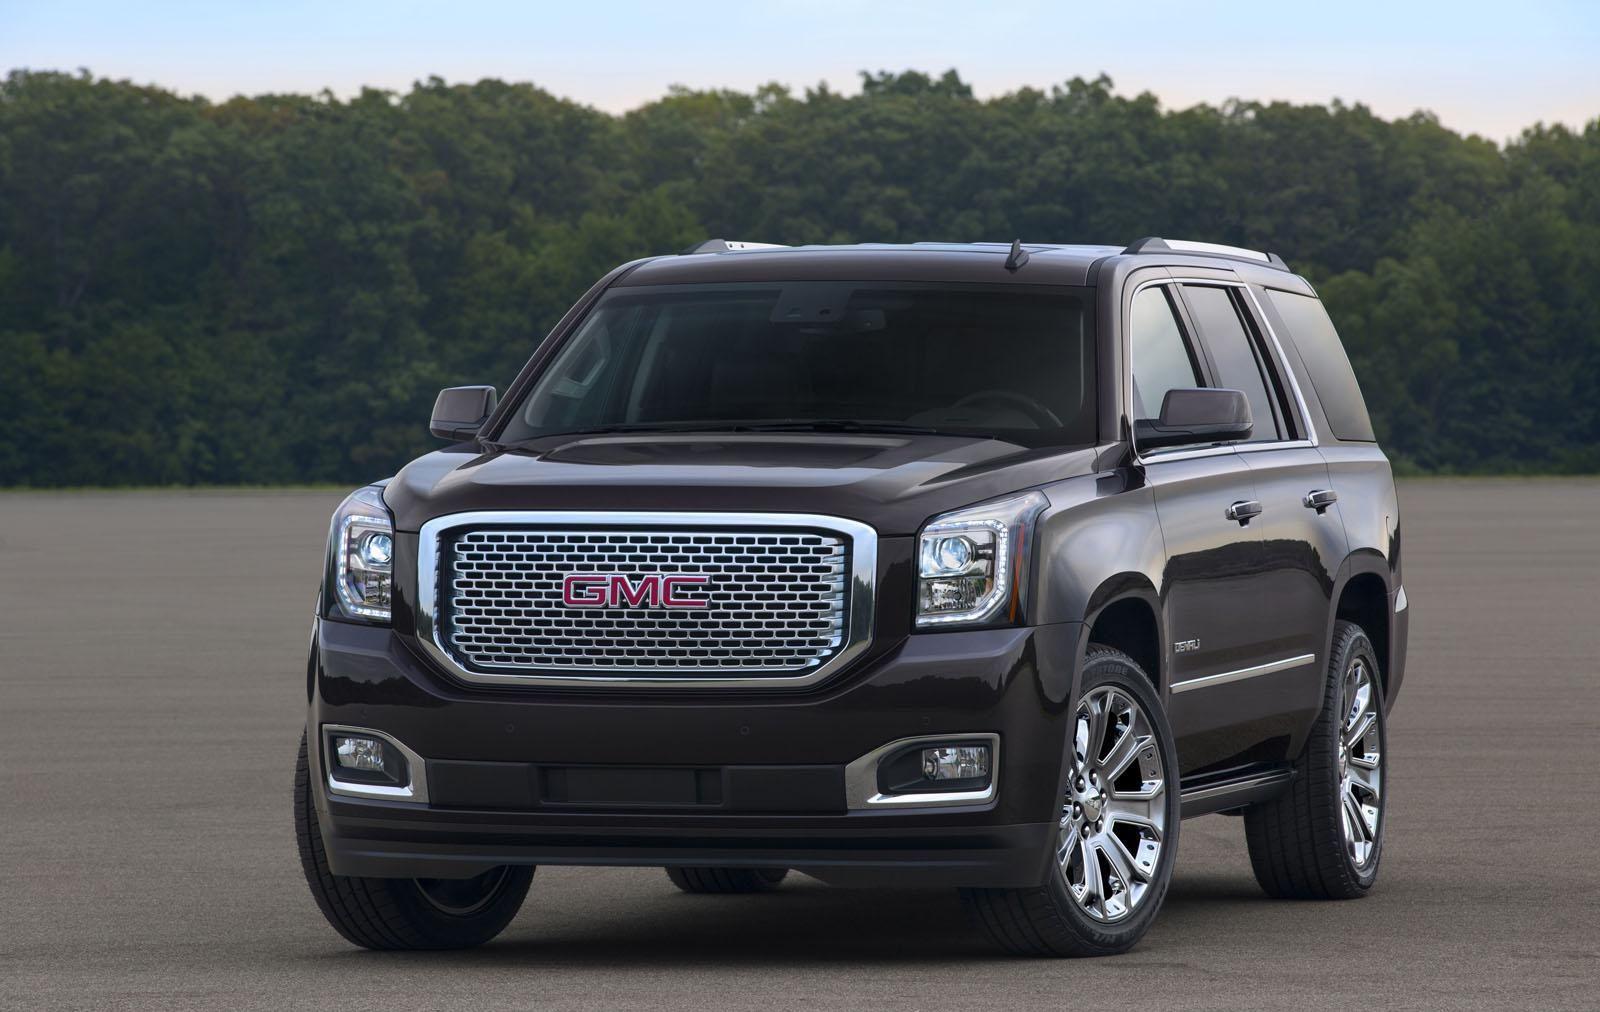 2020 gmc yukon denali concept price and release date rumor new car rumor